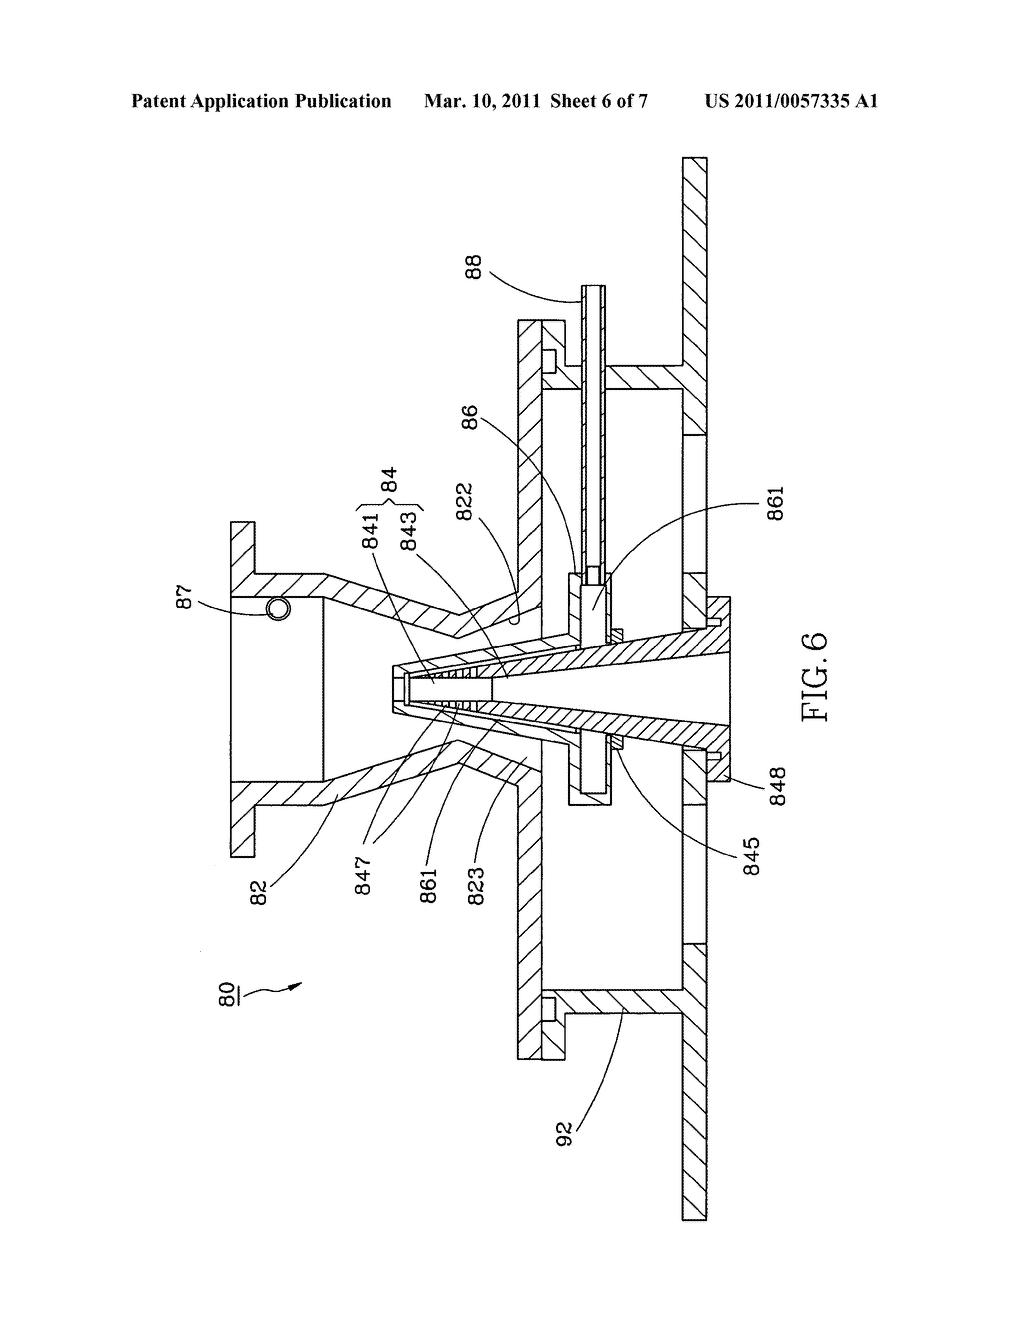 Chevelle Rpm Wiring Diagram